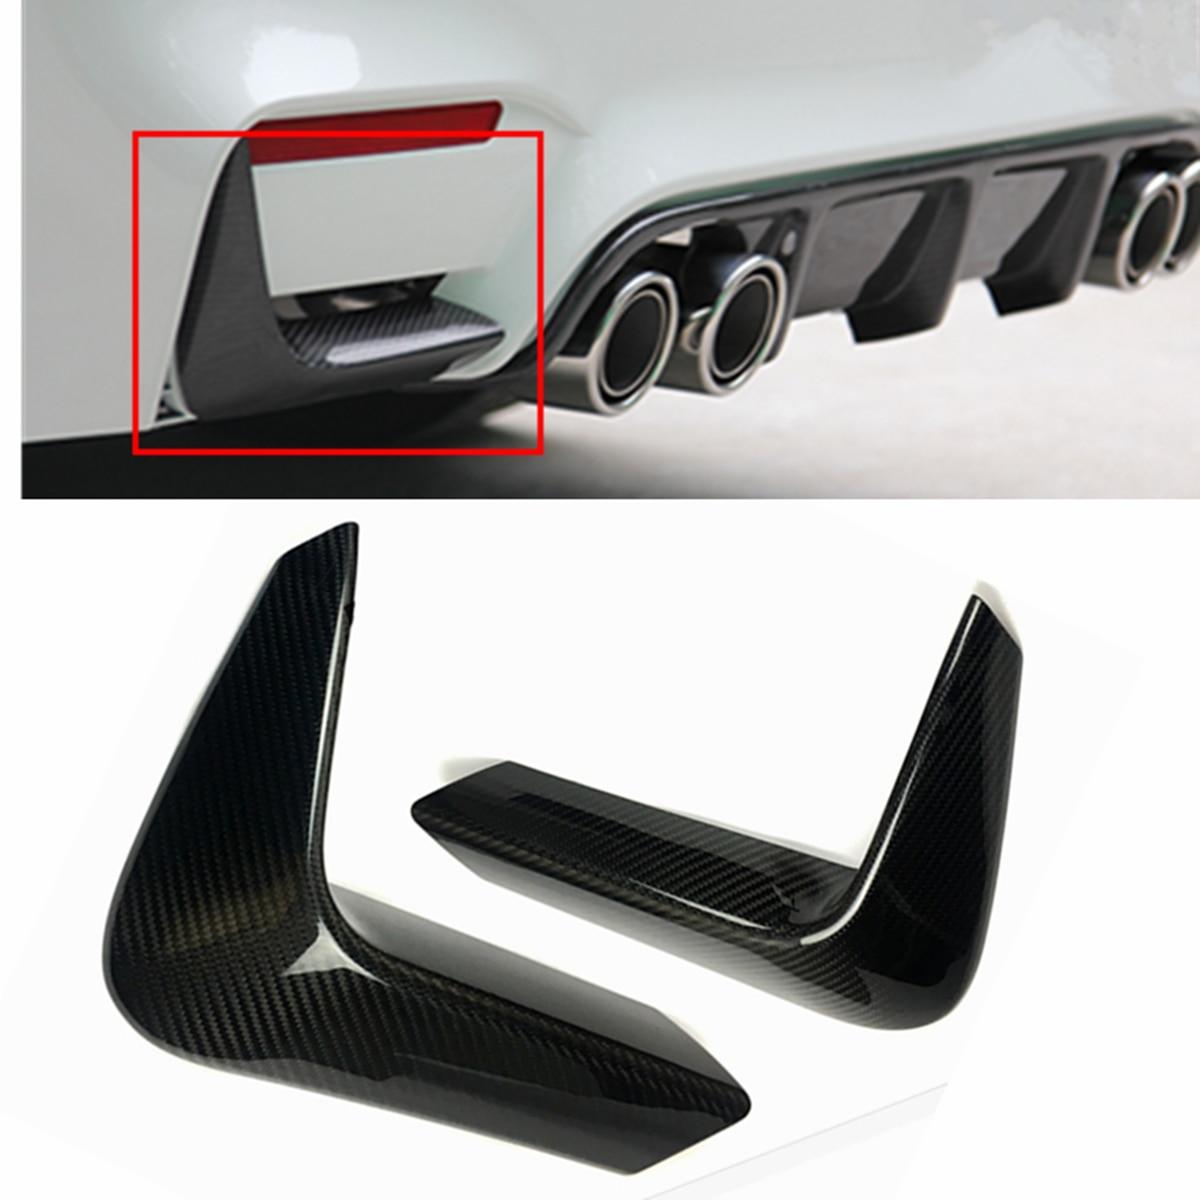 4x Generic Auto Dekoration Rad Reifen Ventilkappe Hülle für Mitsubishi Pajero